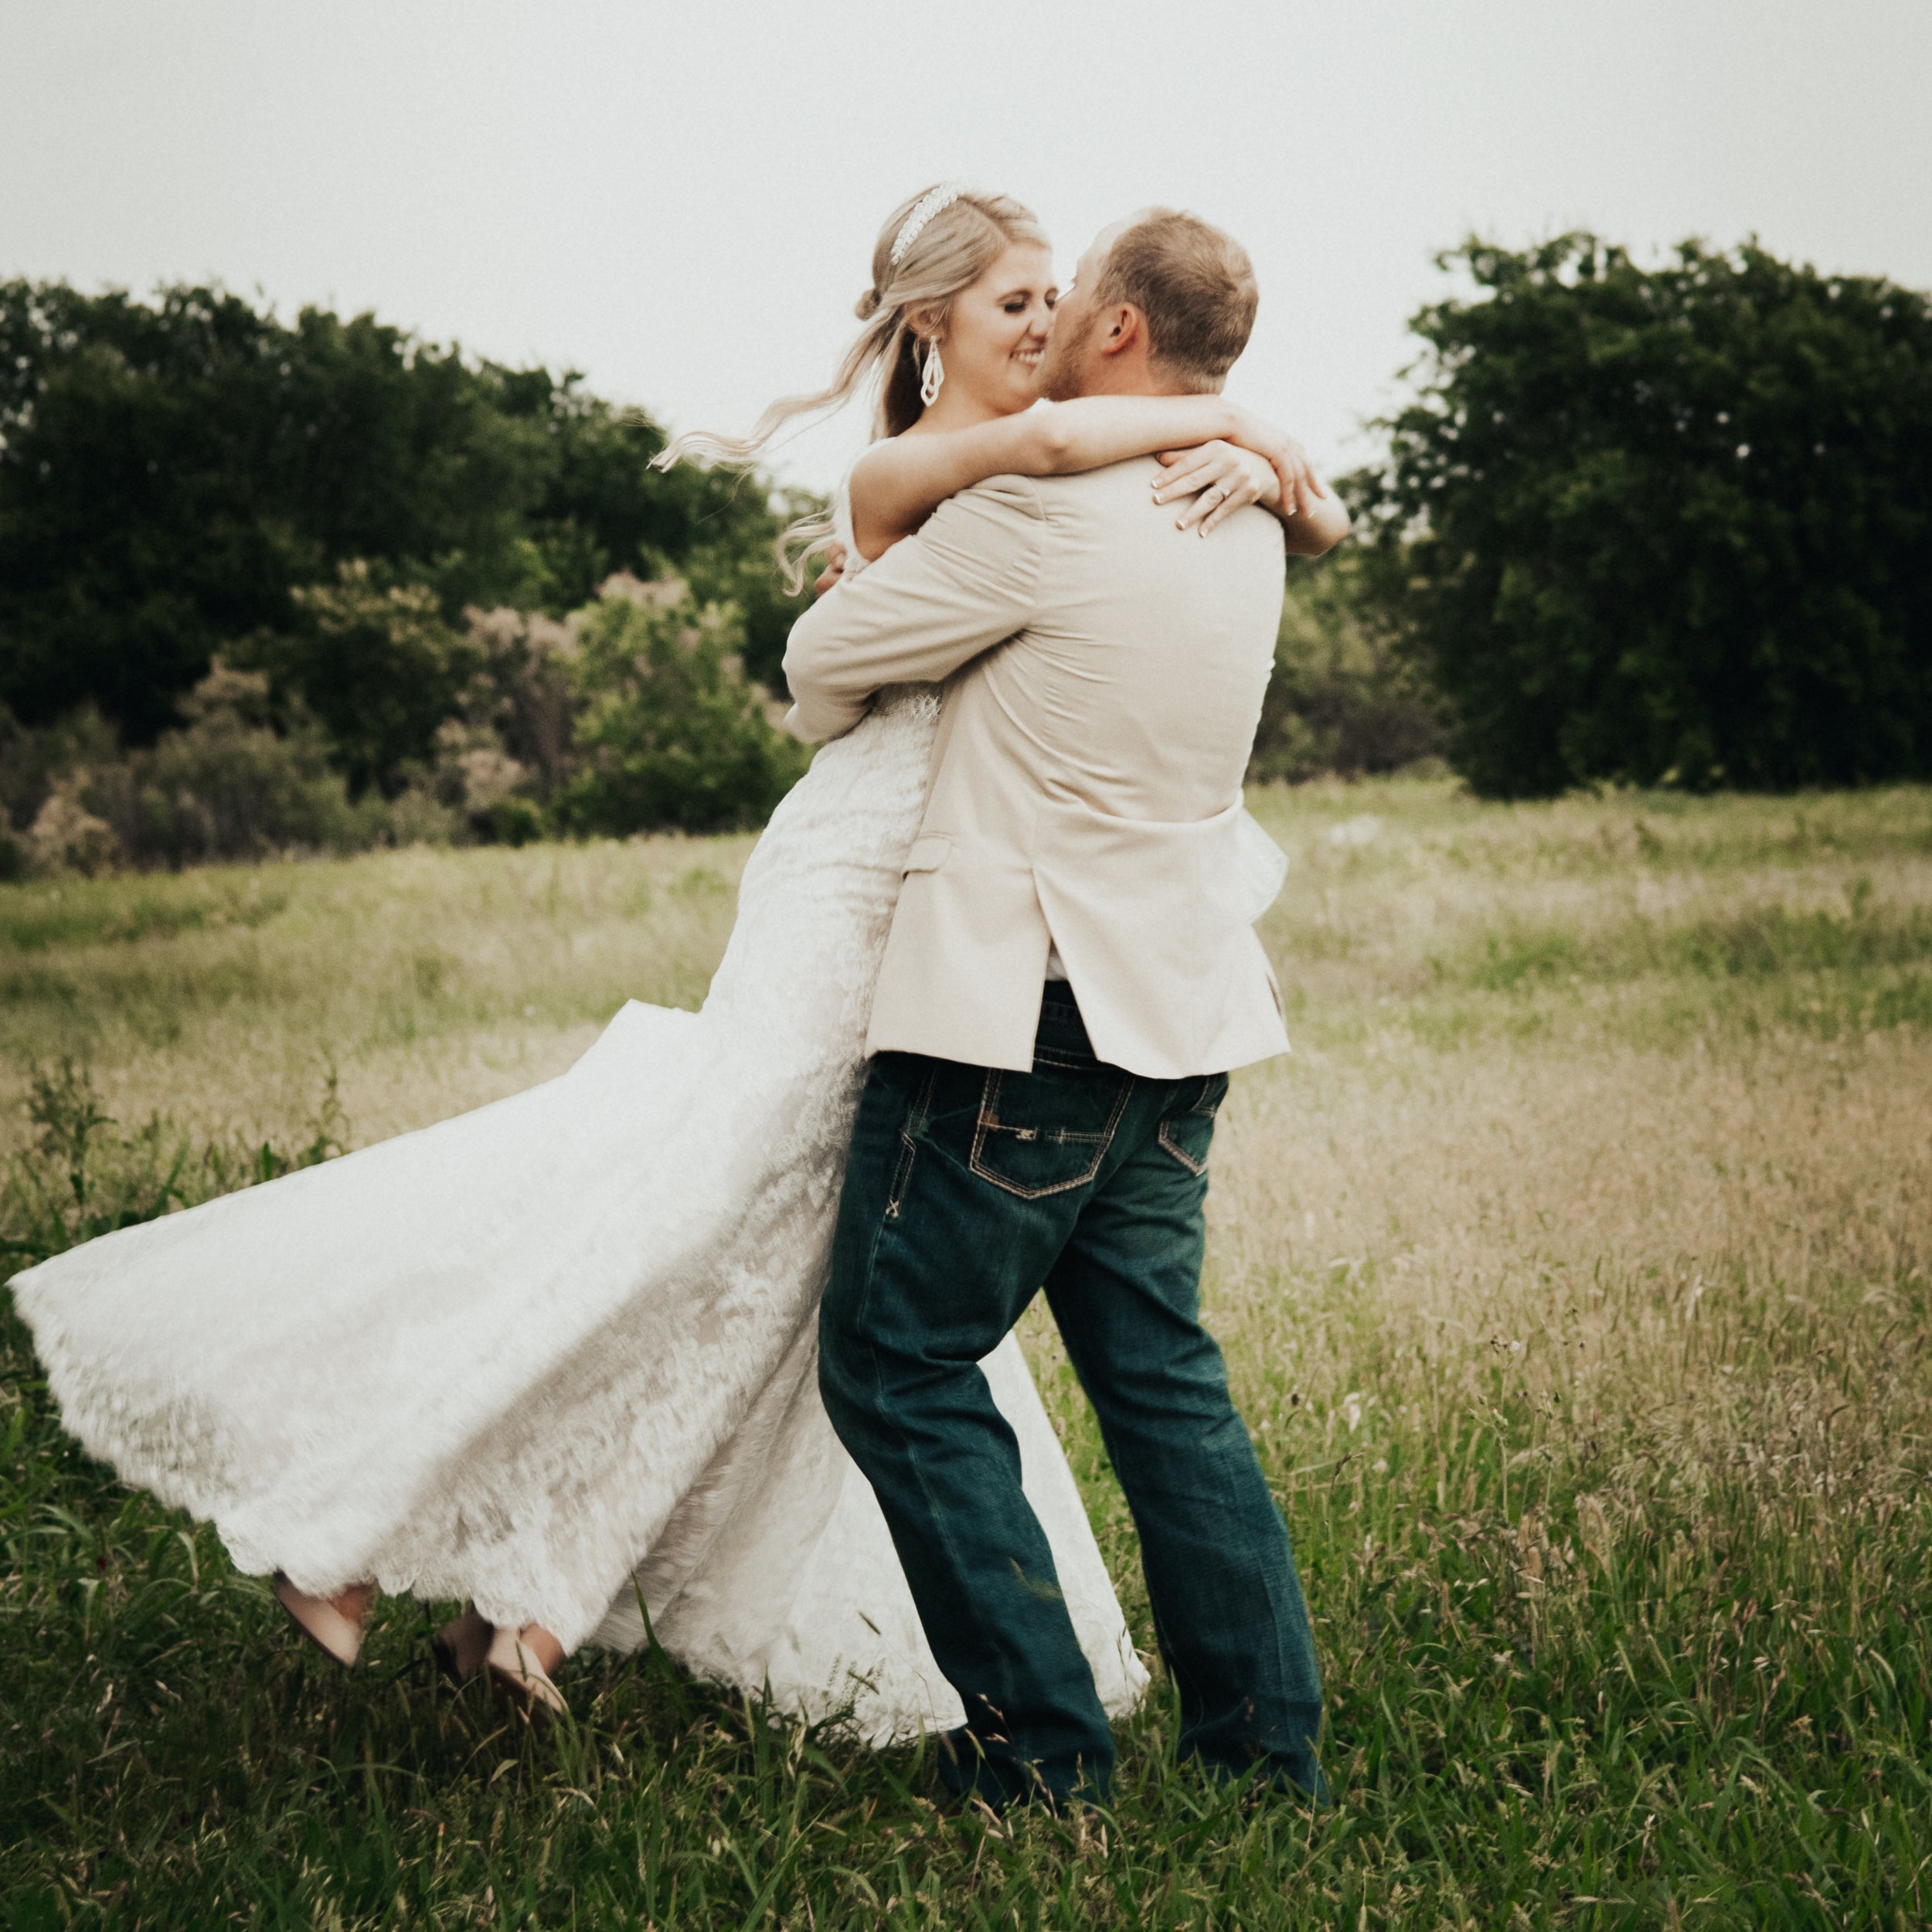 Wedding: $2500-$1000